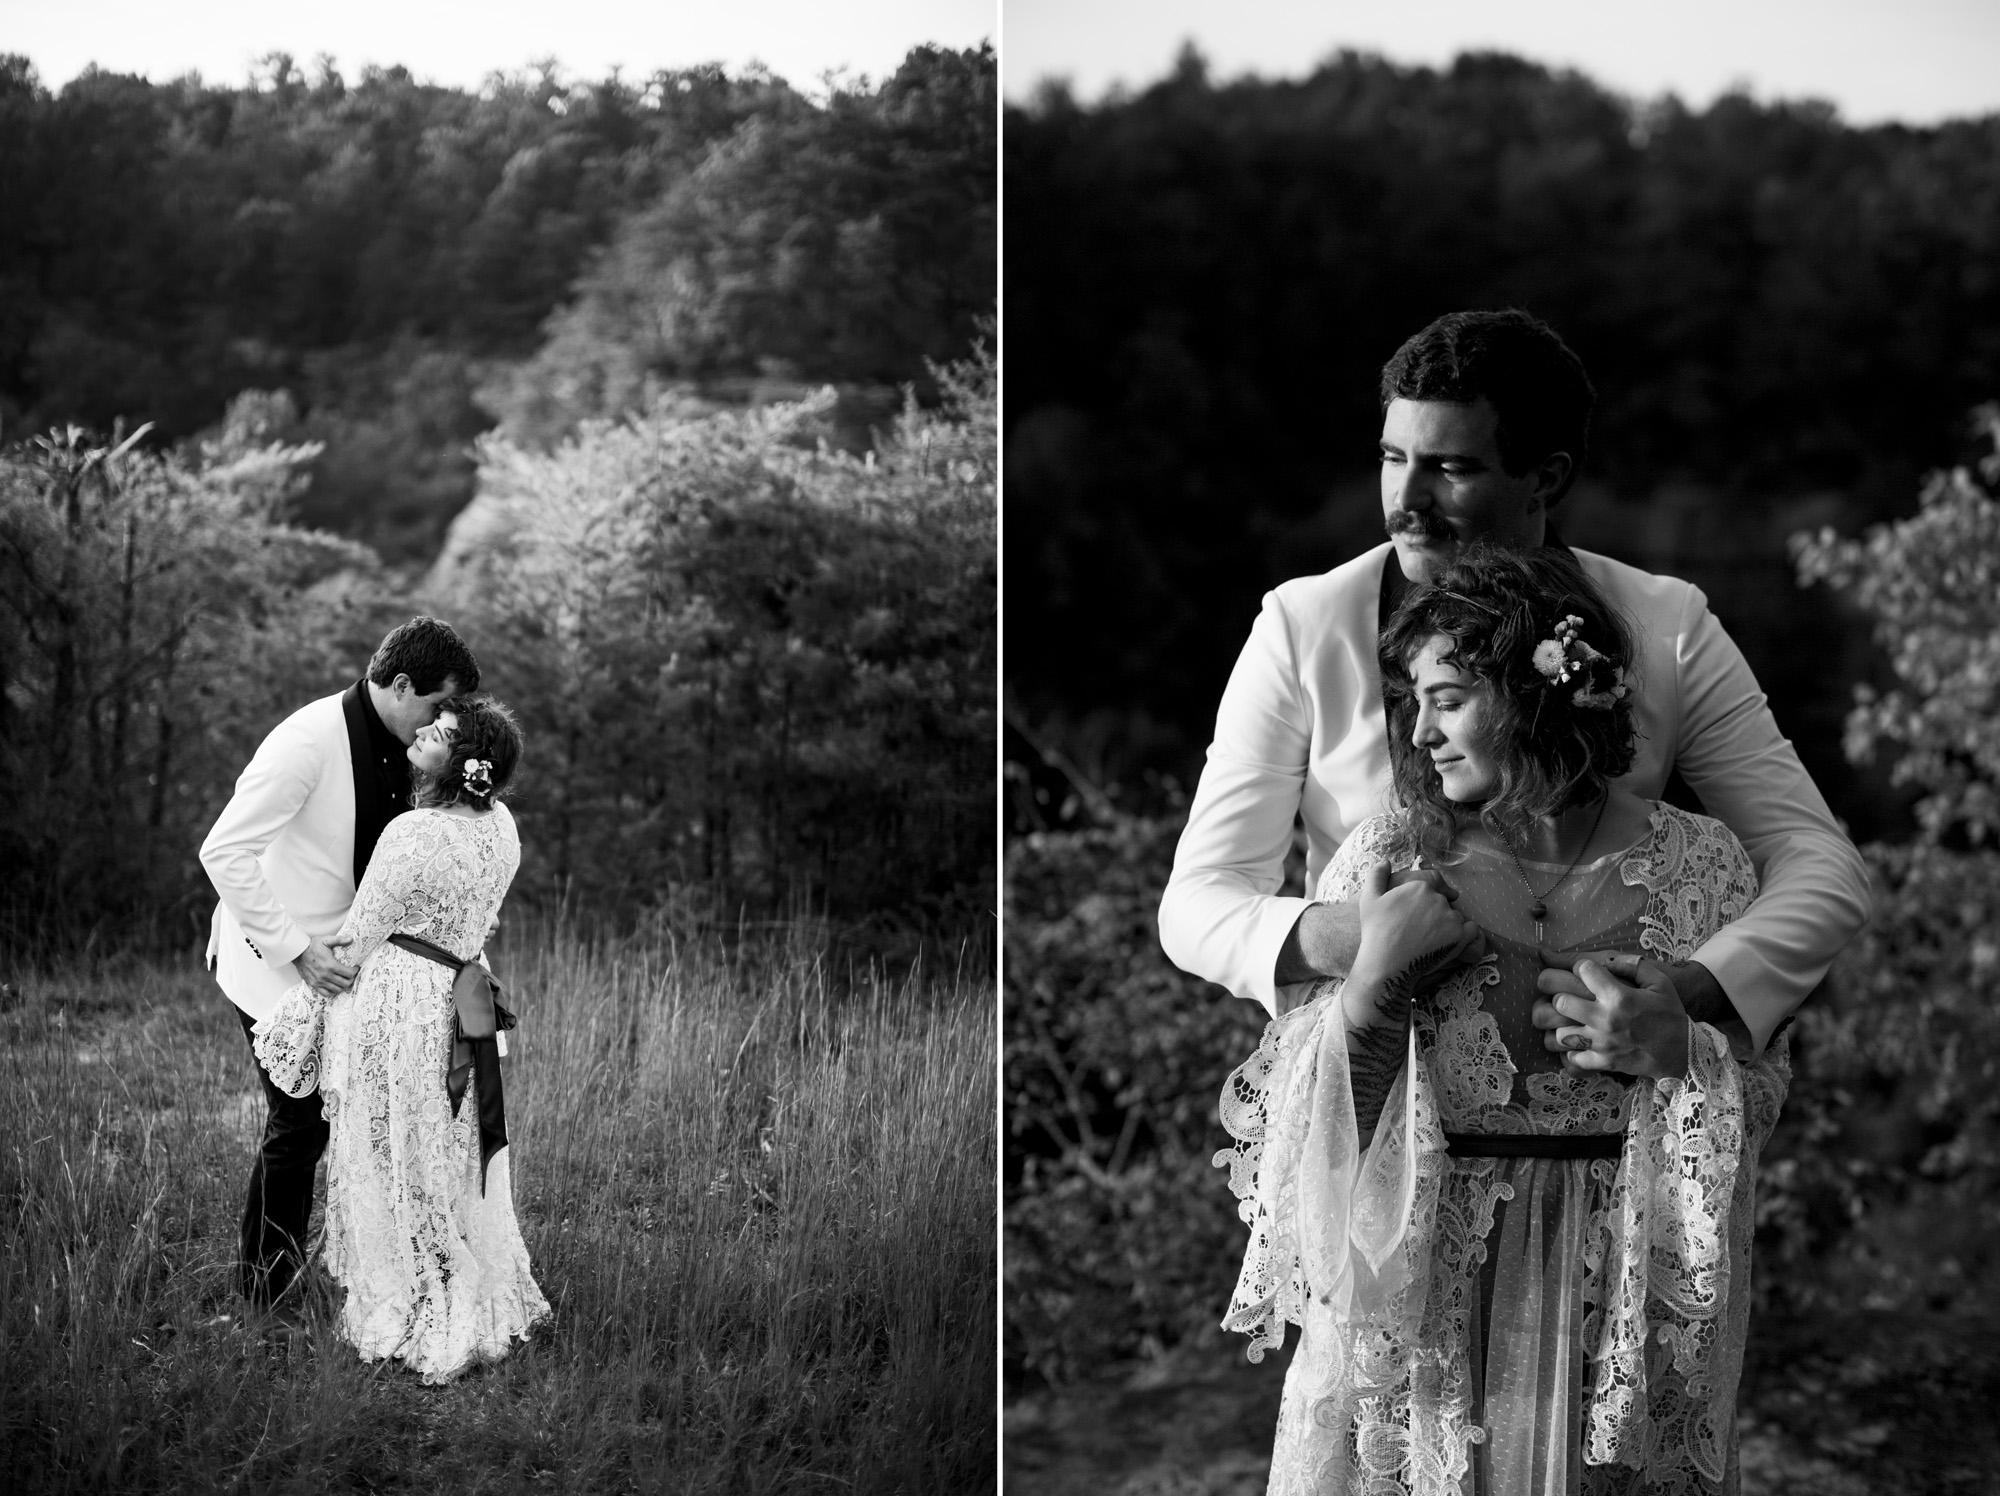 Seriously_Sabrina_Photography_Red_River_Gorge_Kentucky_Wedding_ShawnDana157.jpg